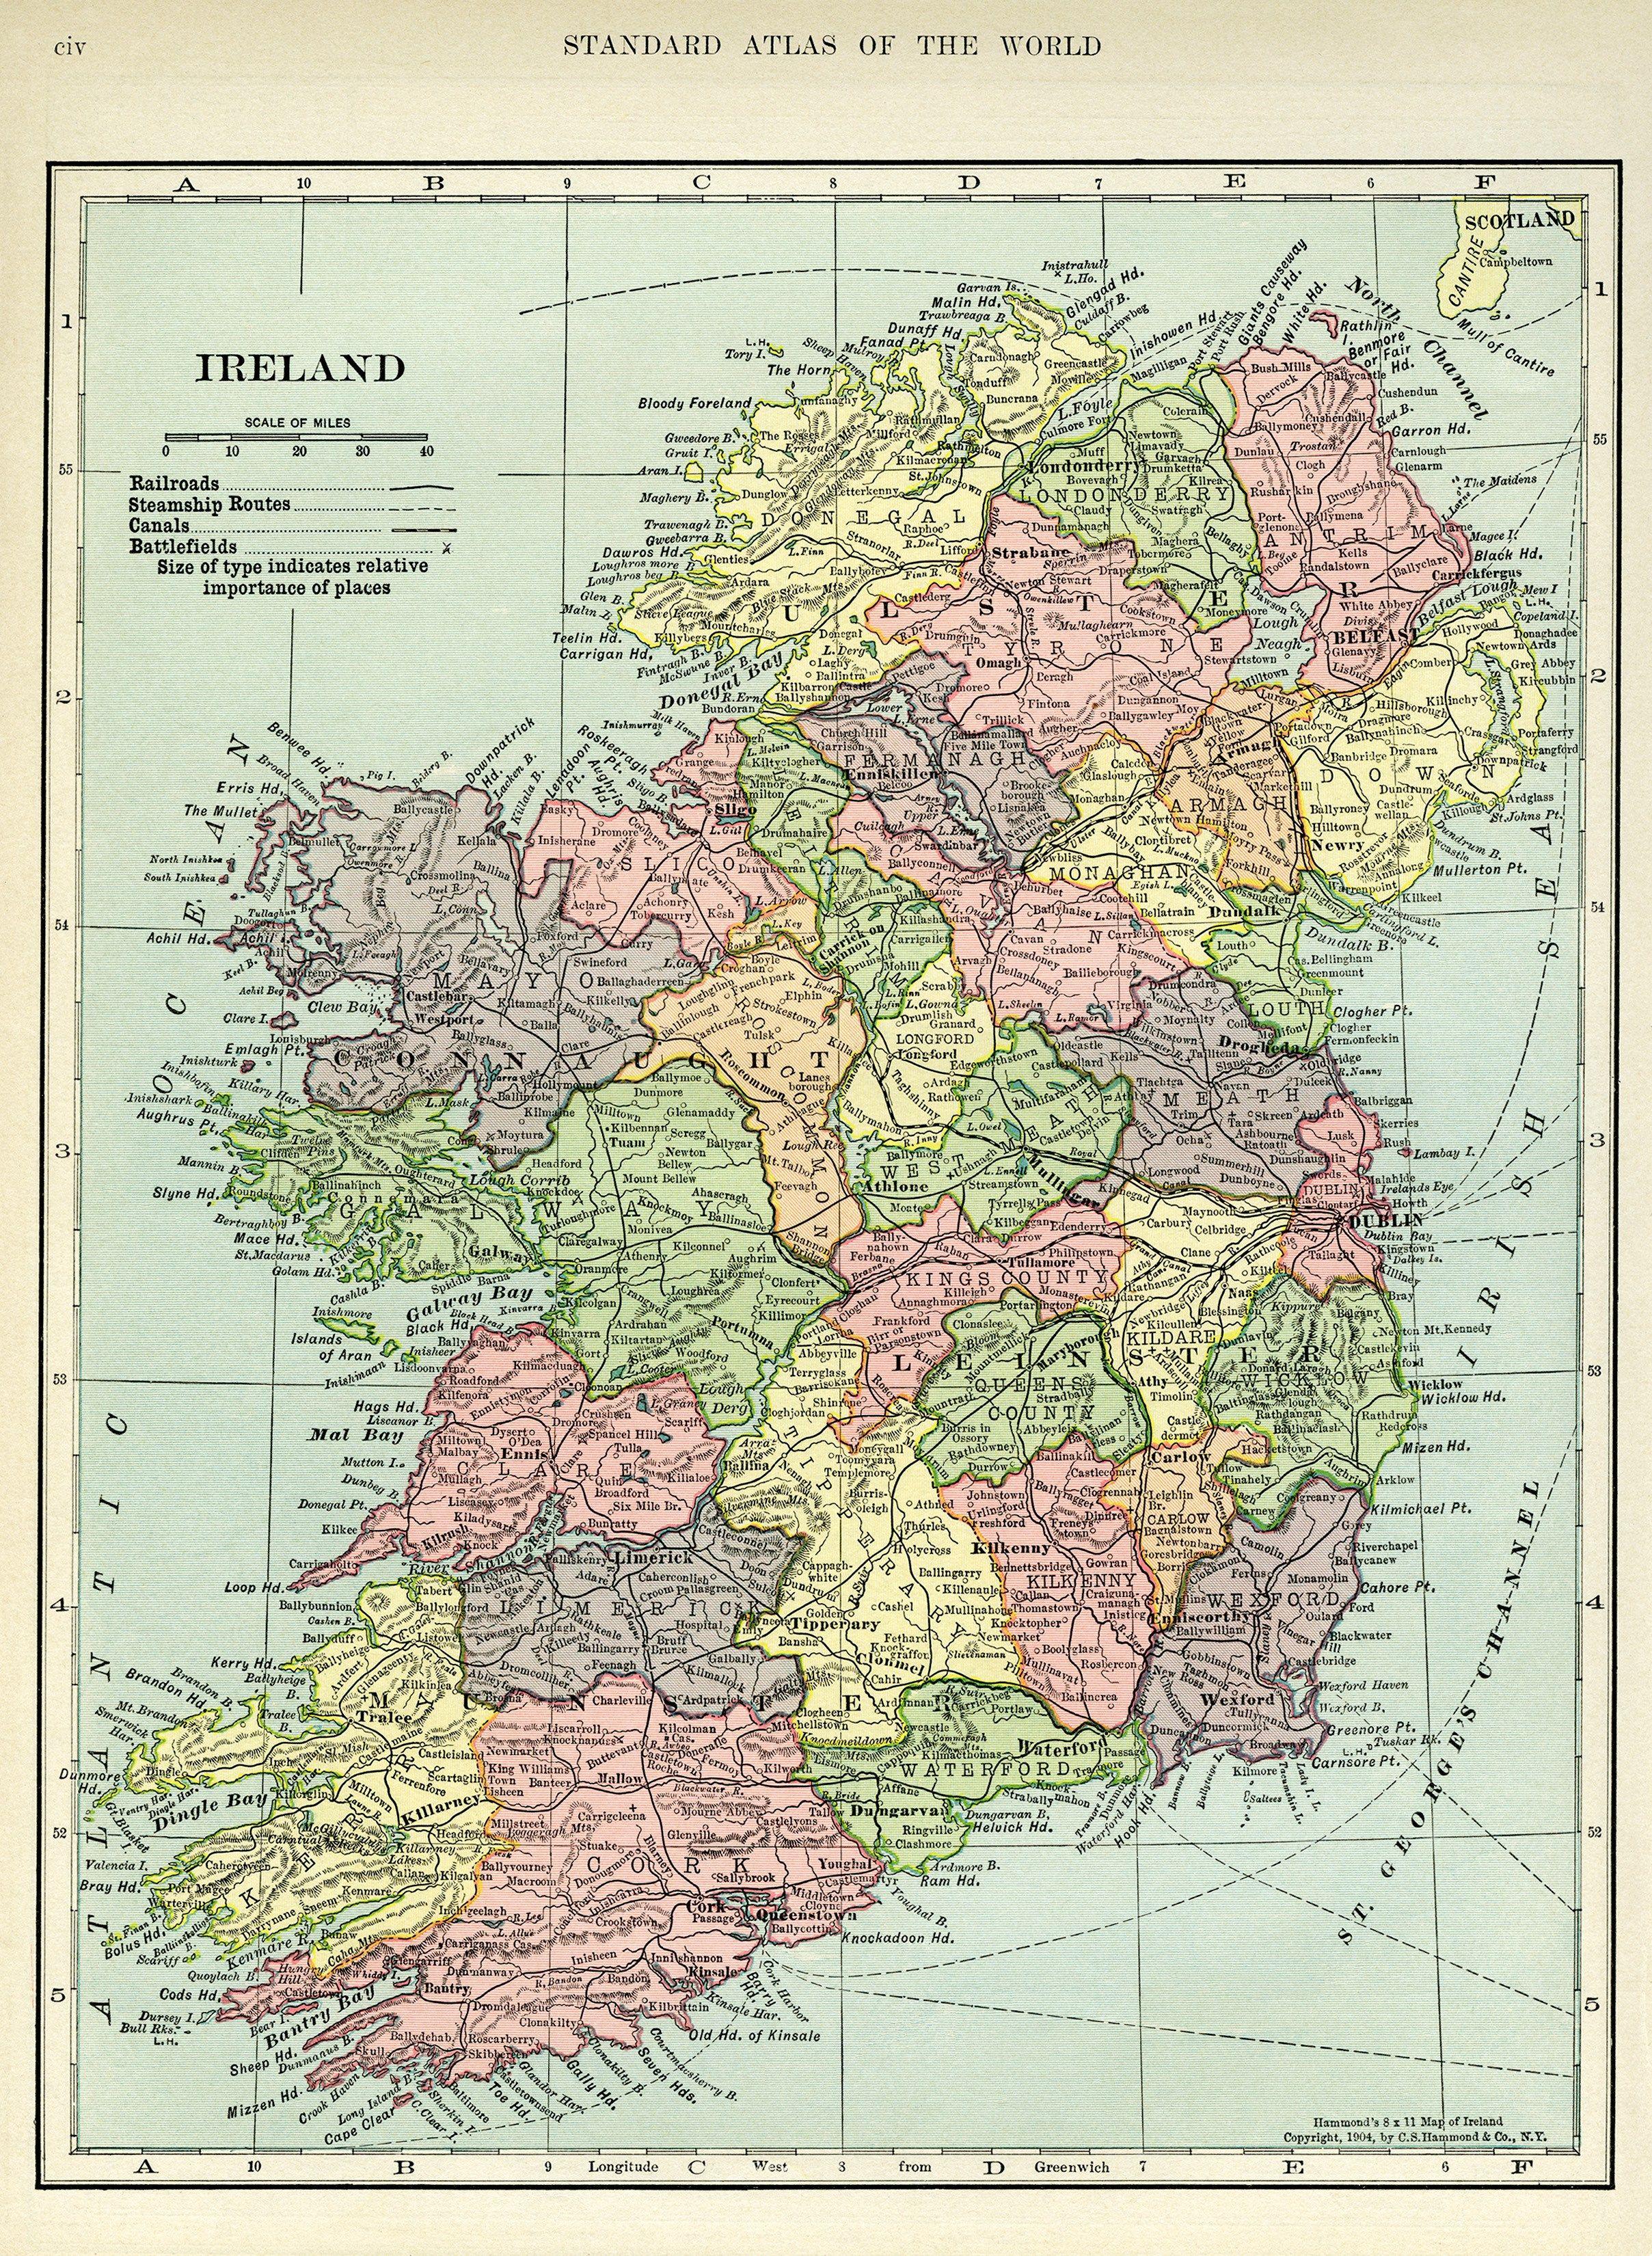 Ireland map vintage map download antique map c s hammond ireland map vintage map download antique map c s hammond history geography ireland gumiabroncs Images